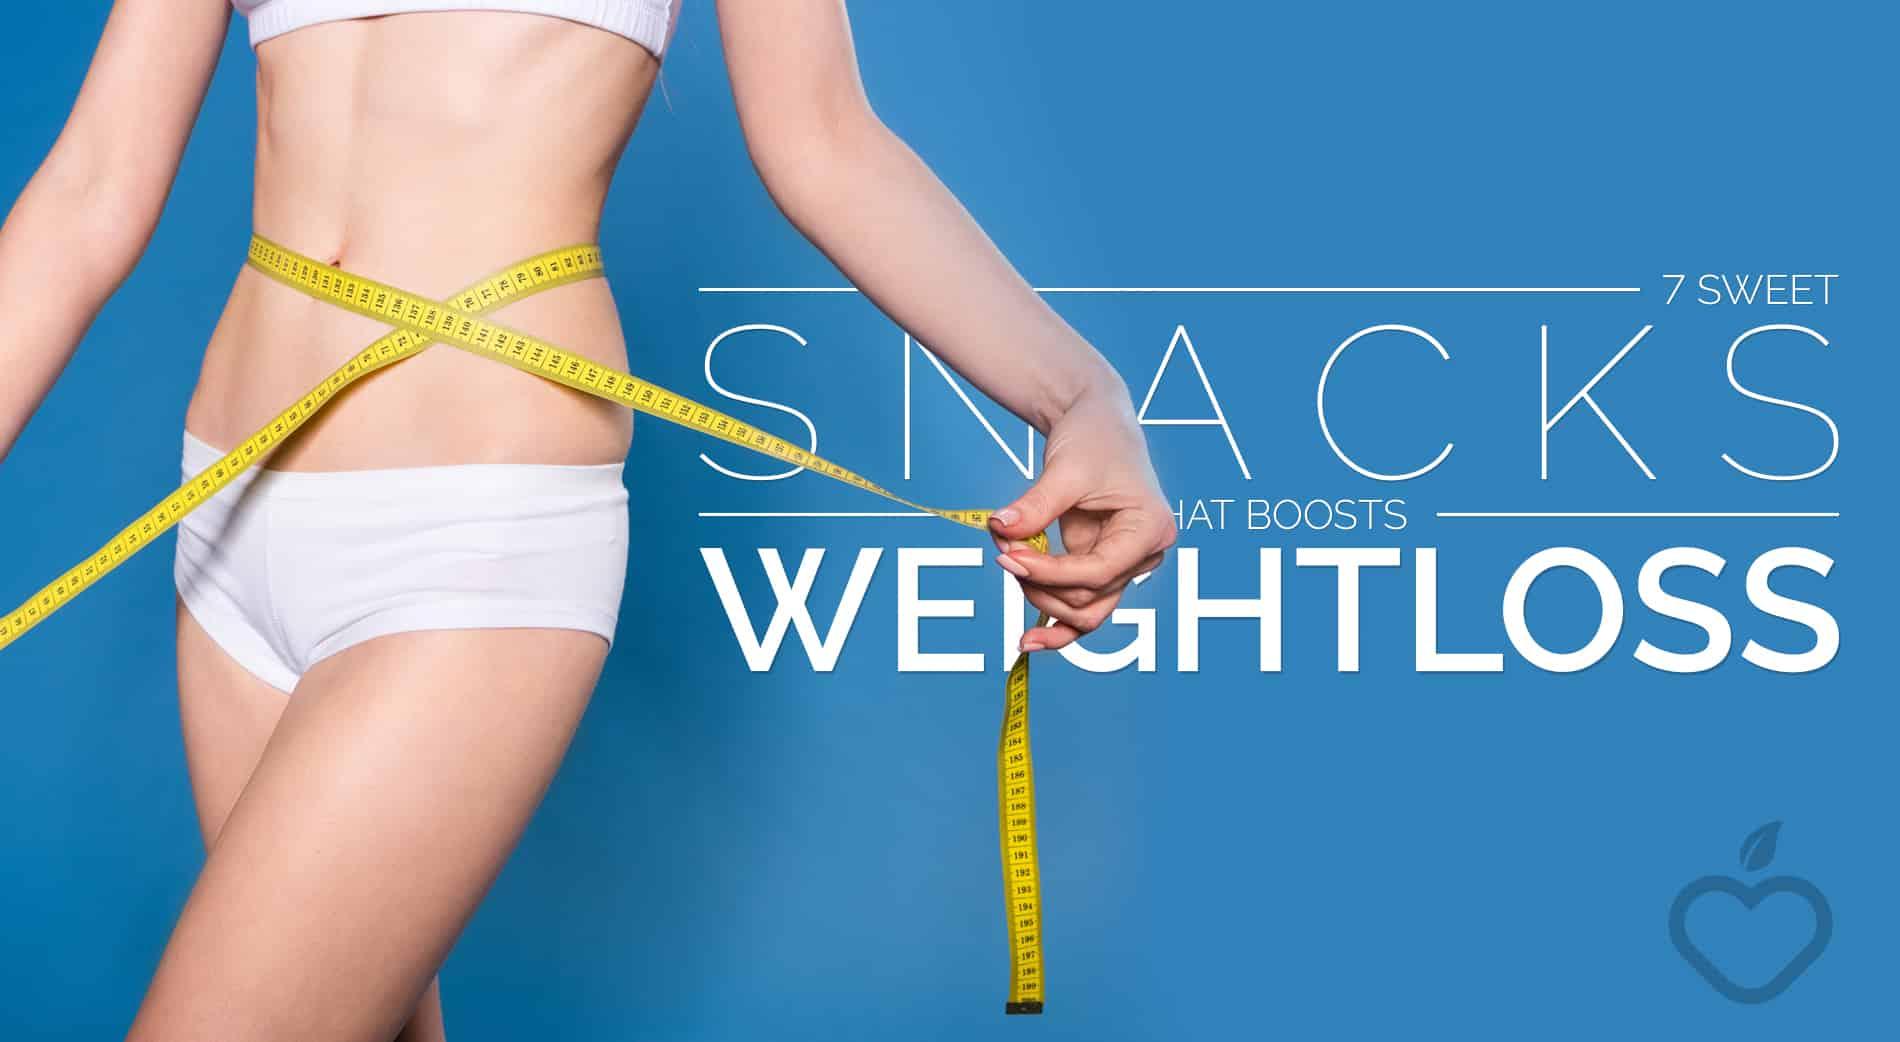 Weightloss Image Design 1 - 7 Sweet Snacks That Boosts Weightloss